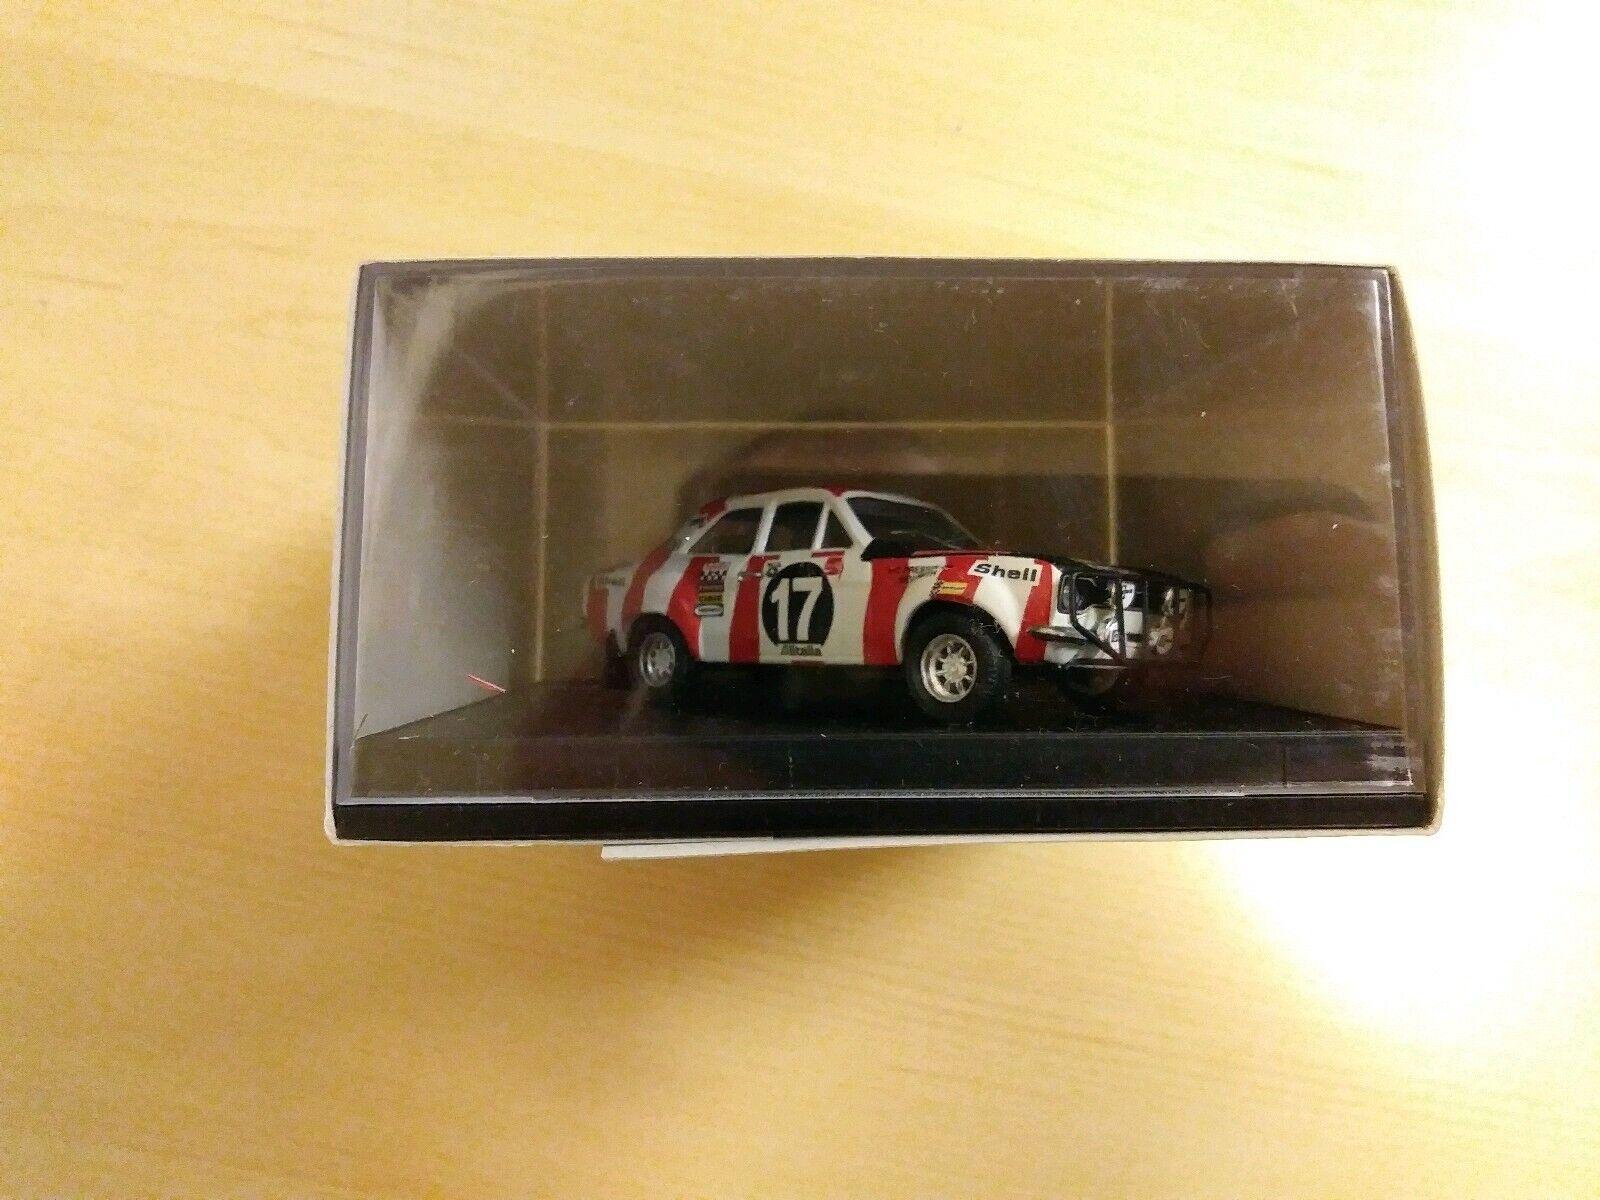 Trofeu Ford Escort 1600 TC Vic Preston - SAFARI 71 - ref 521